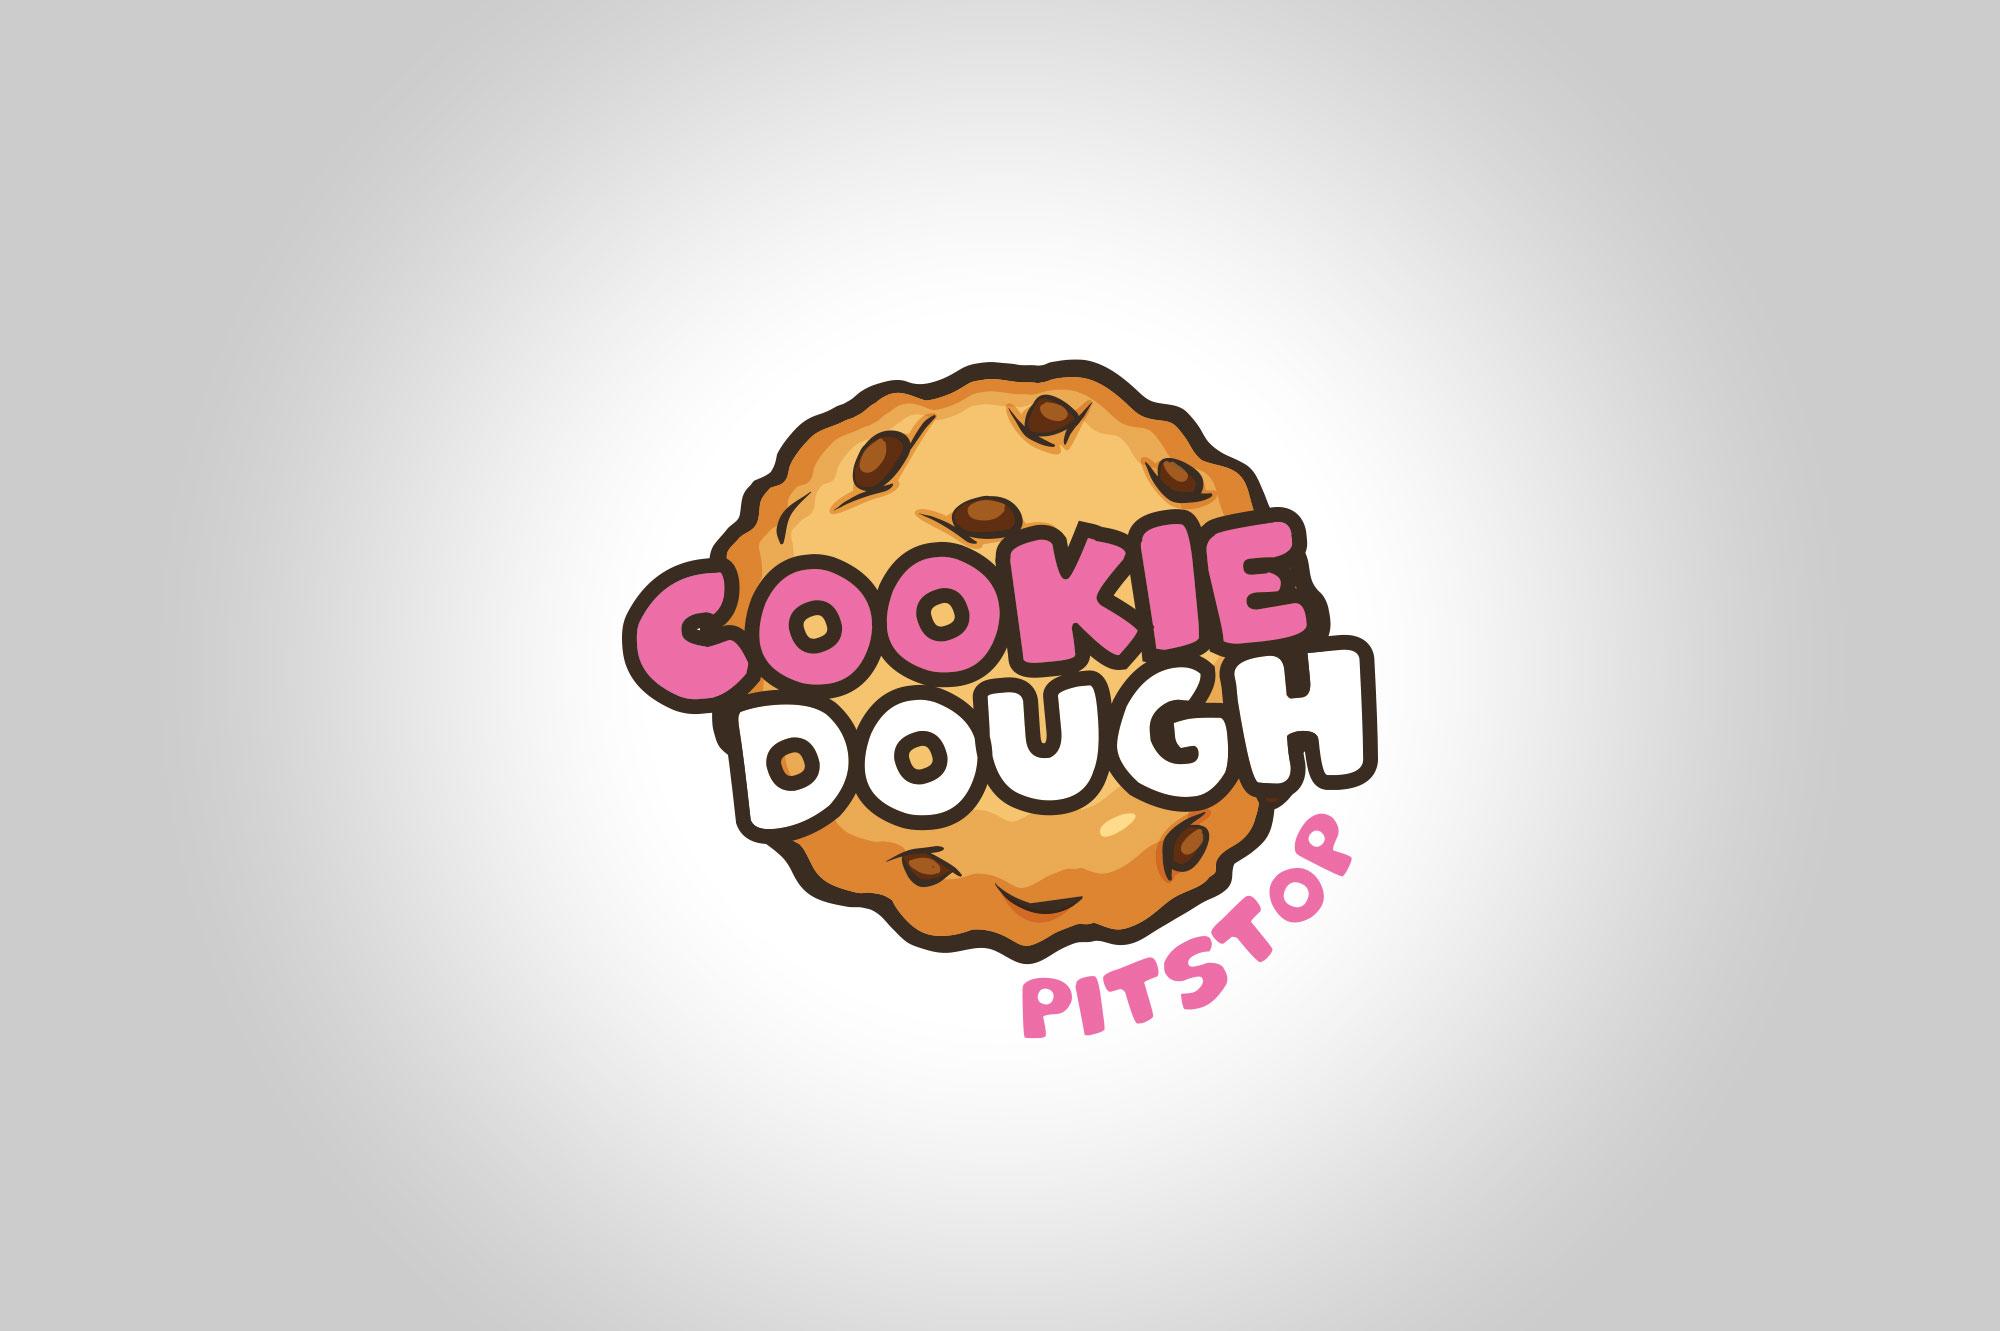 Cookie Dough Pitstop Logo Design